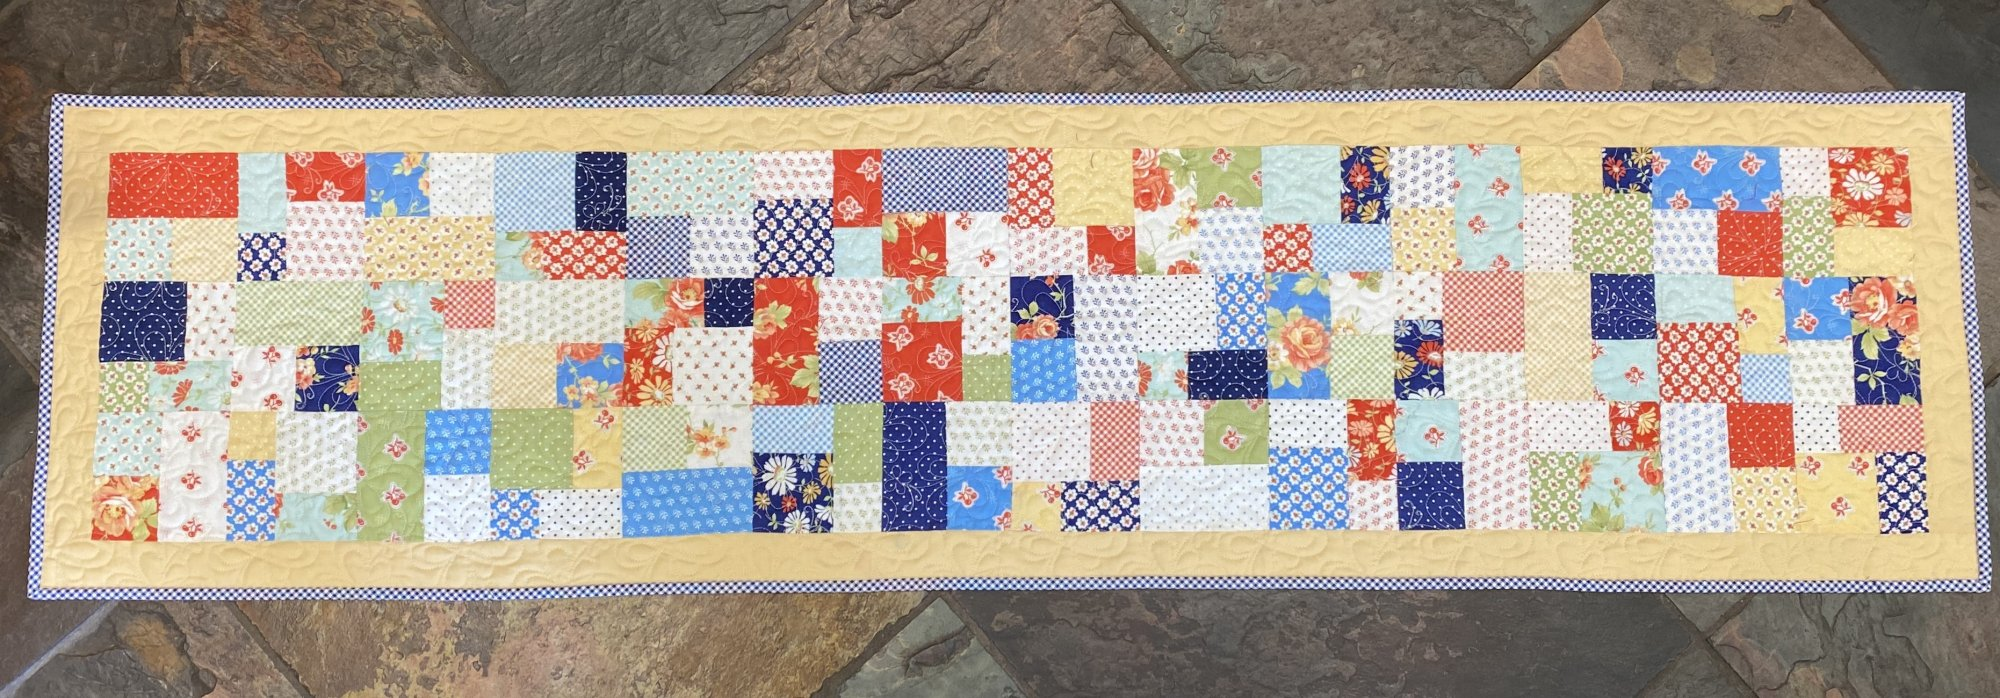 Mini Brick Road Table Runner 15 1/2 x 59 1/2